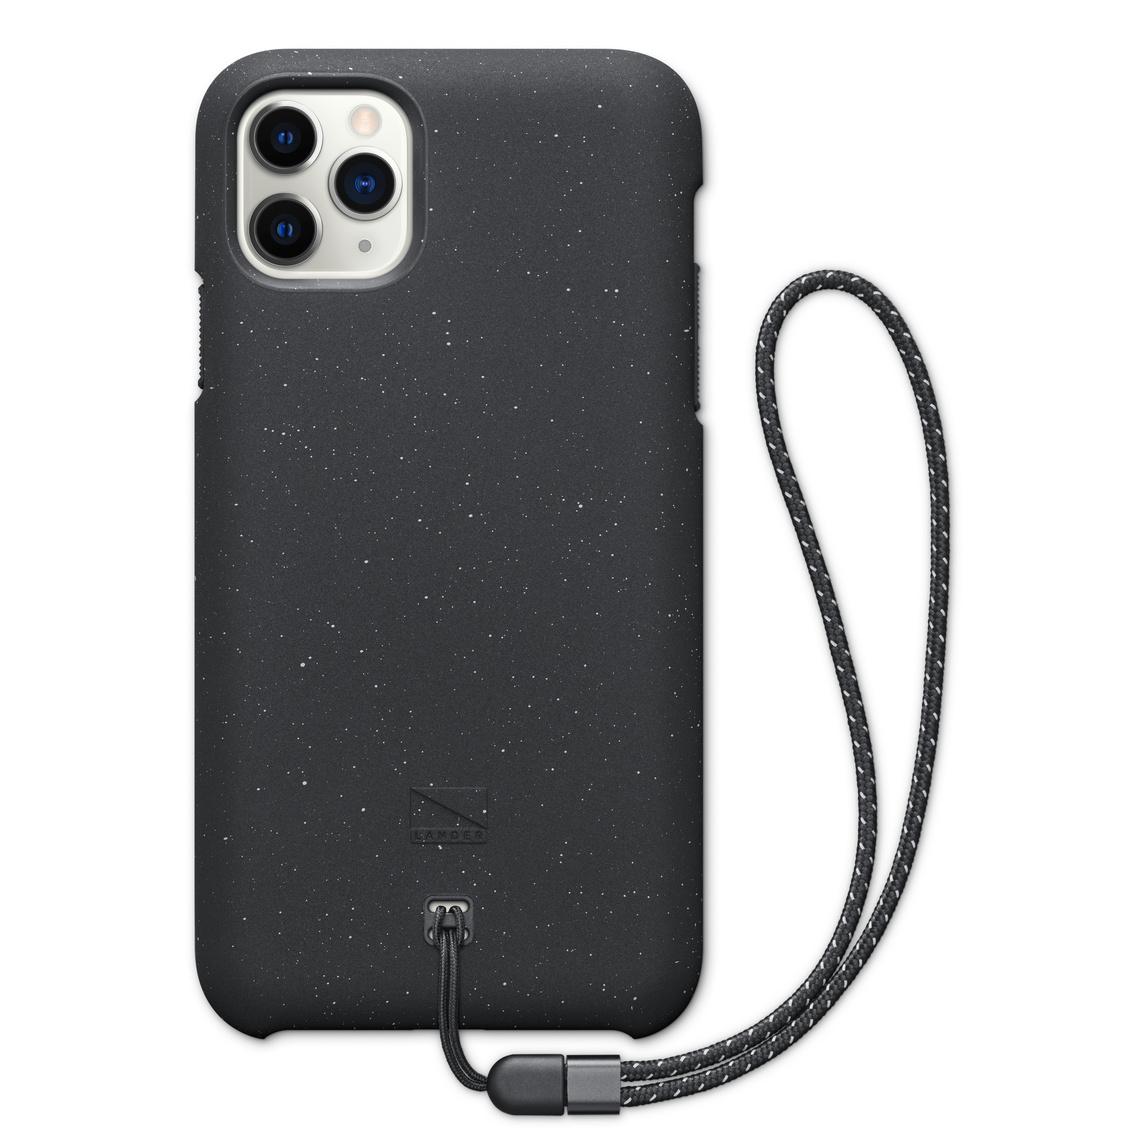 Lander Torrey Case for iPhone 11 Pro Max - Black - Apple (CA)